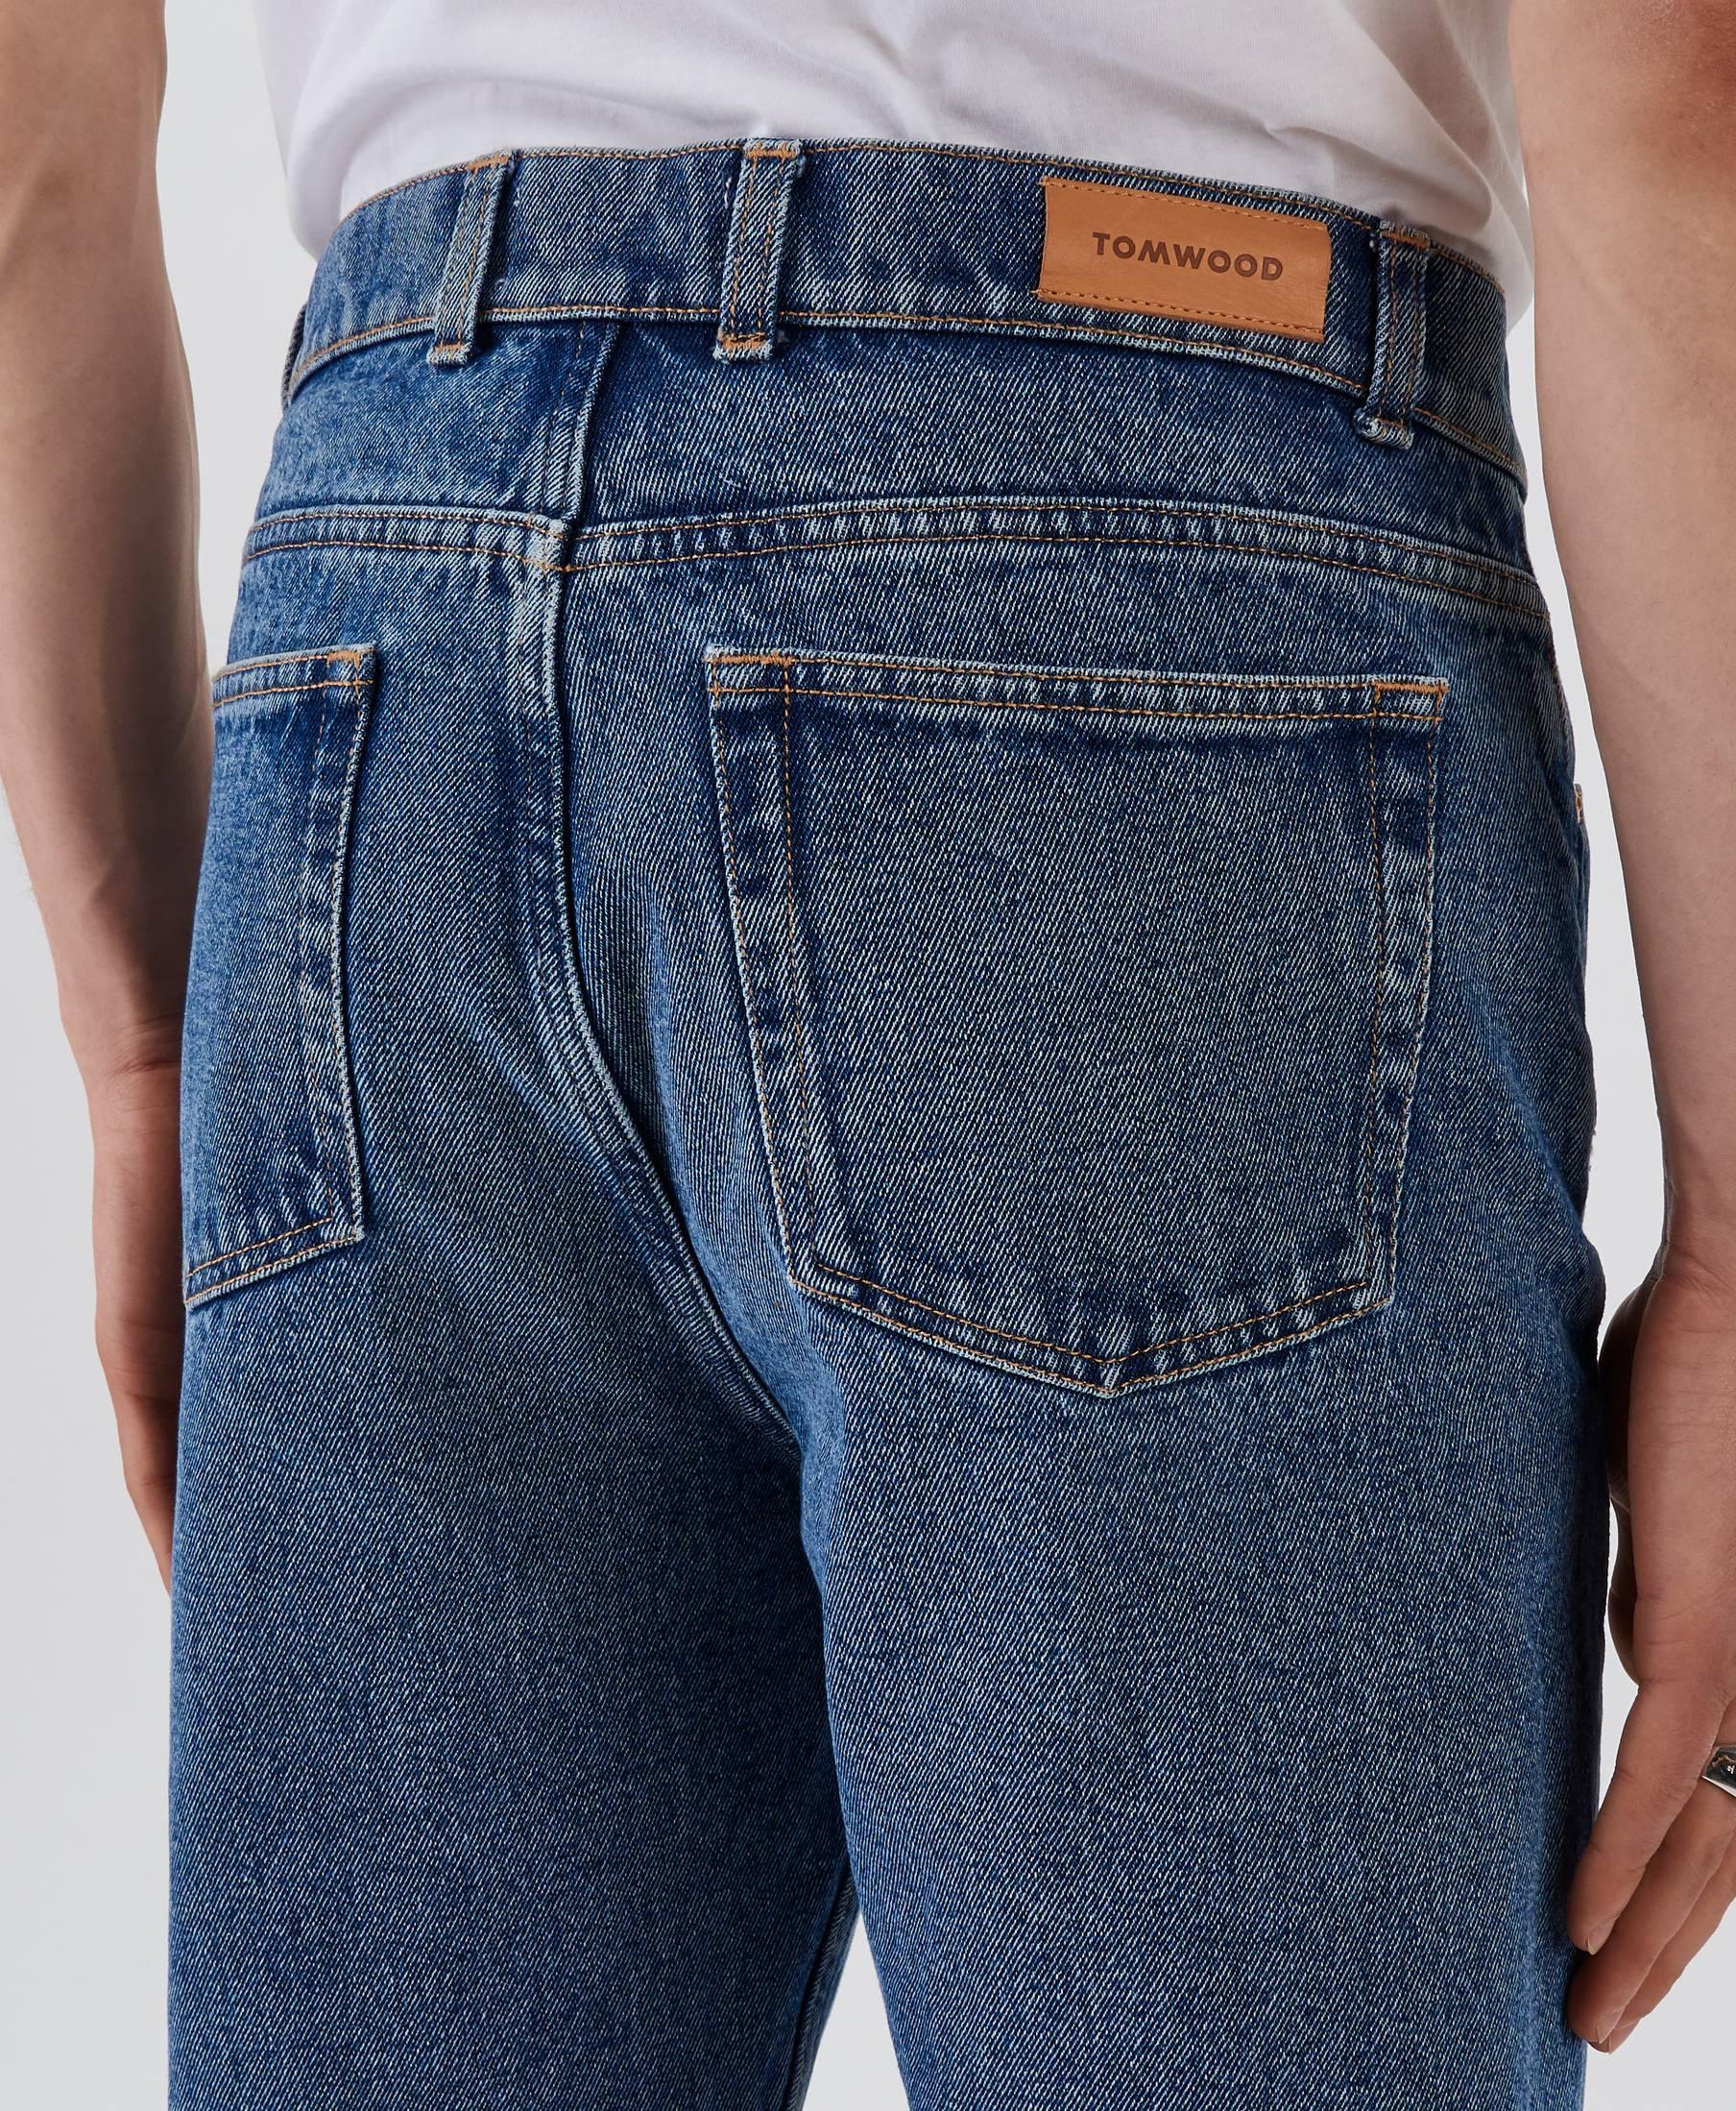 Sting Denim Pants Nice Blue